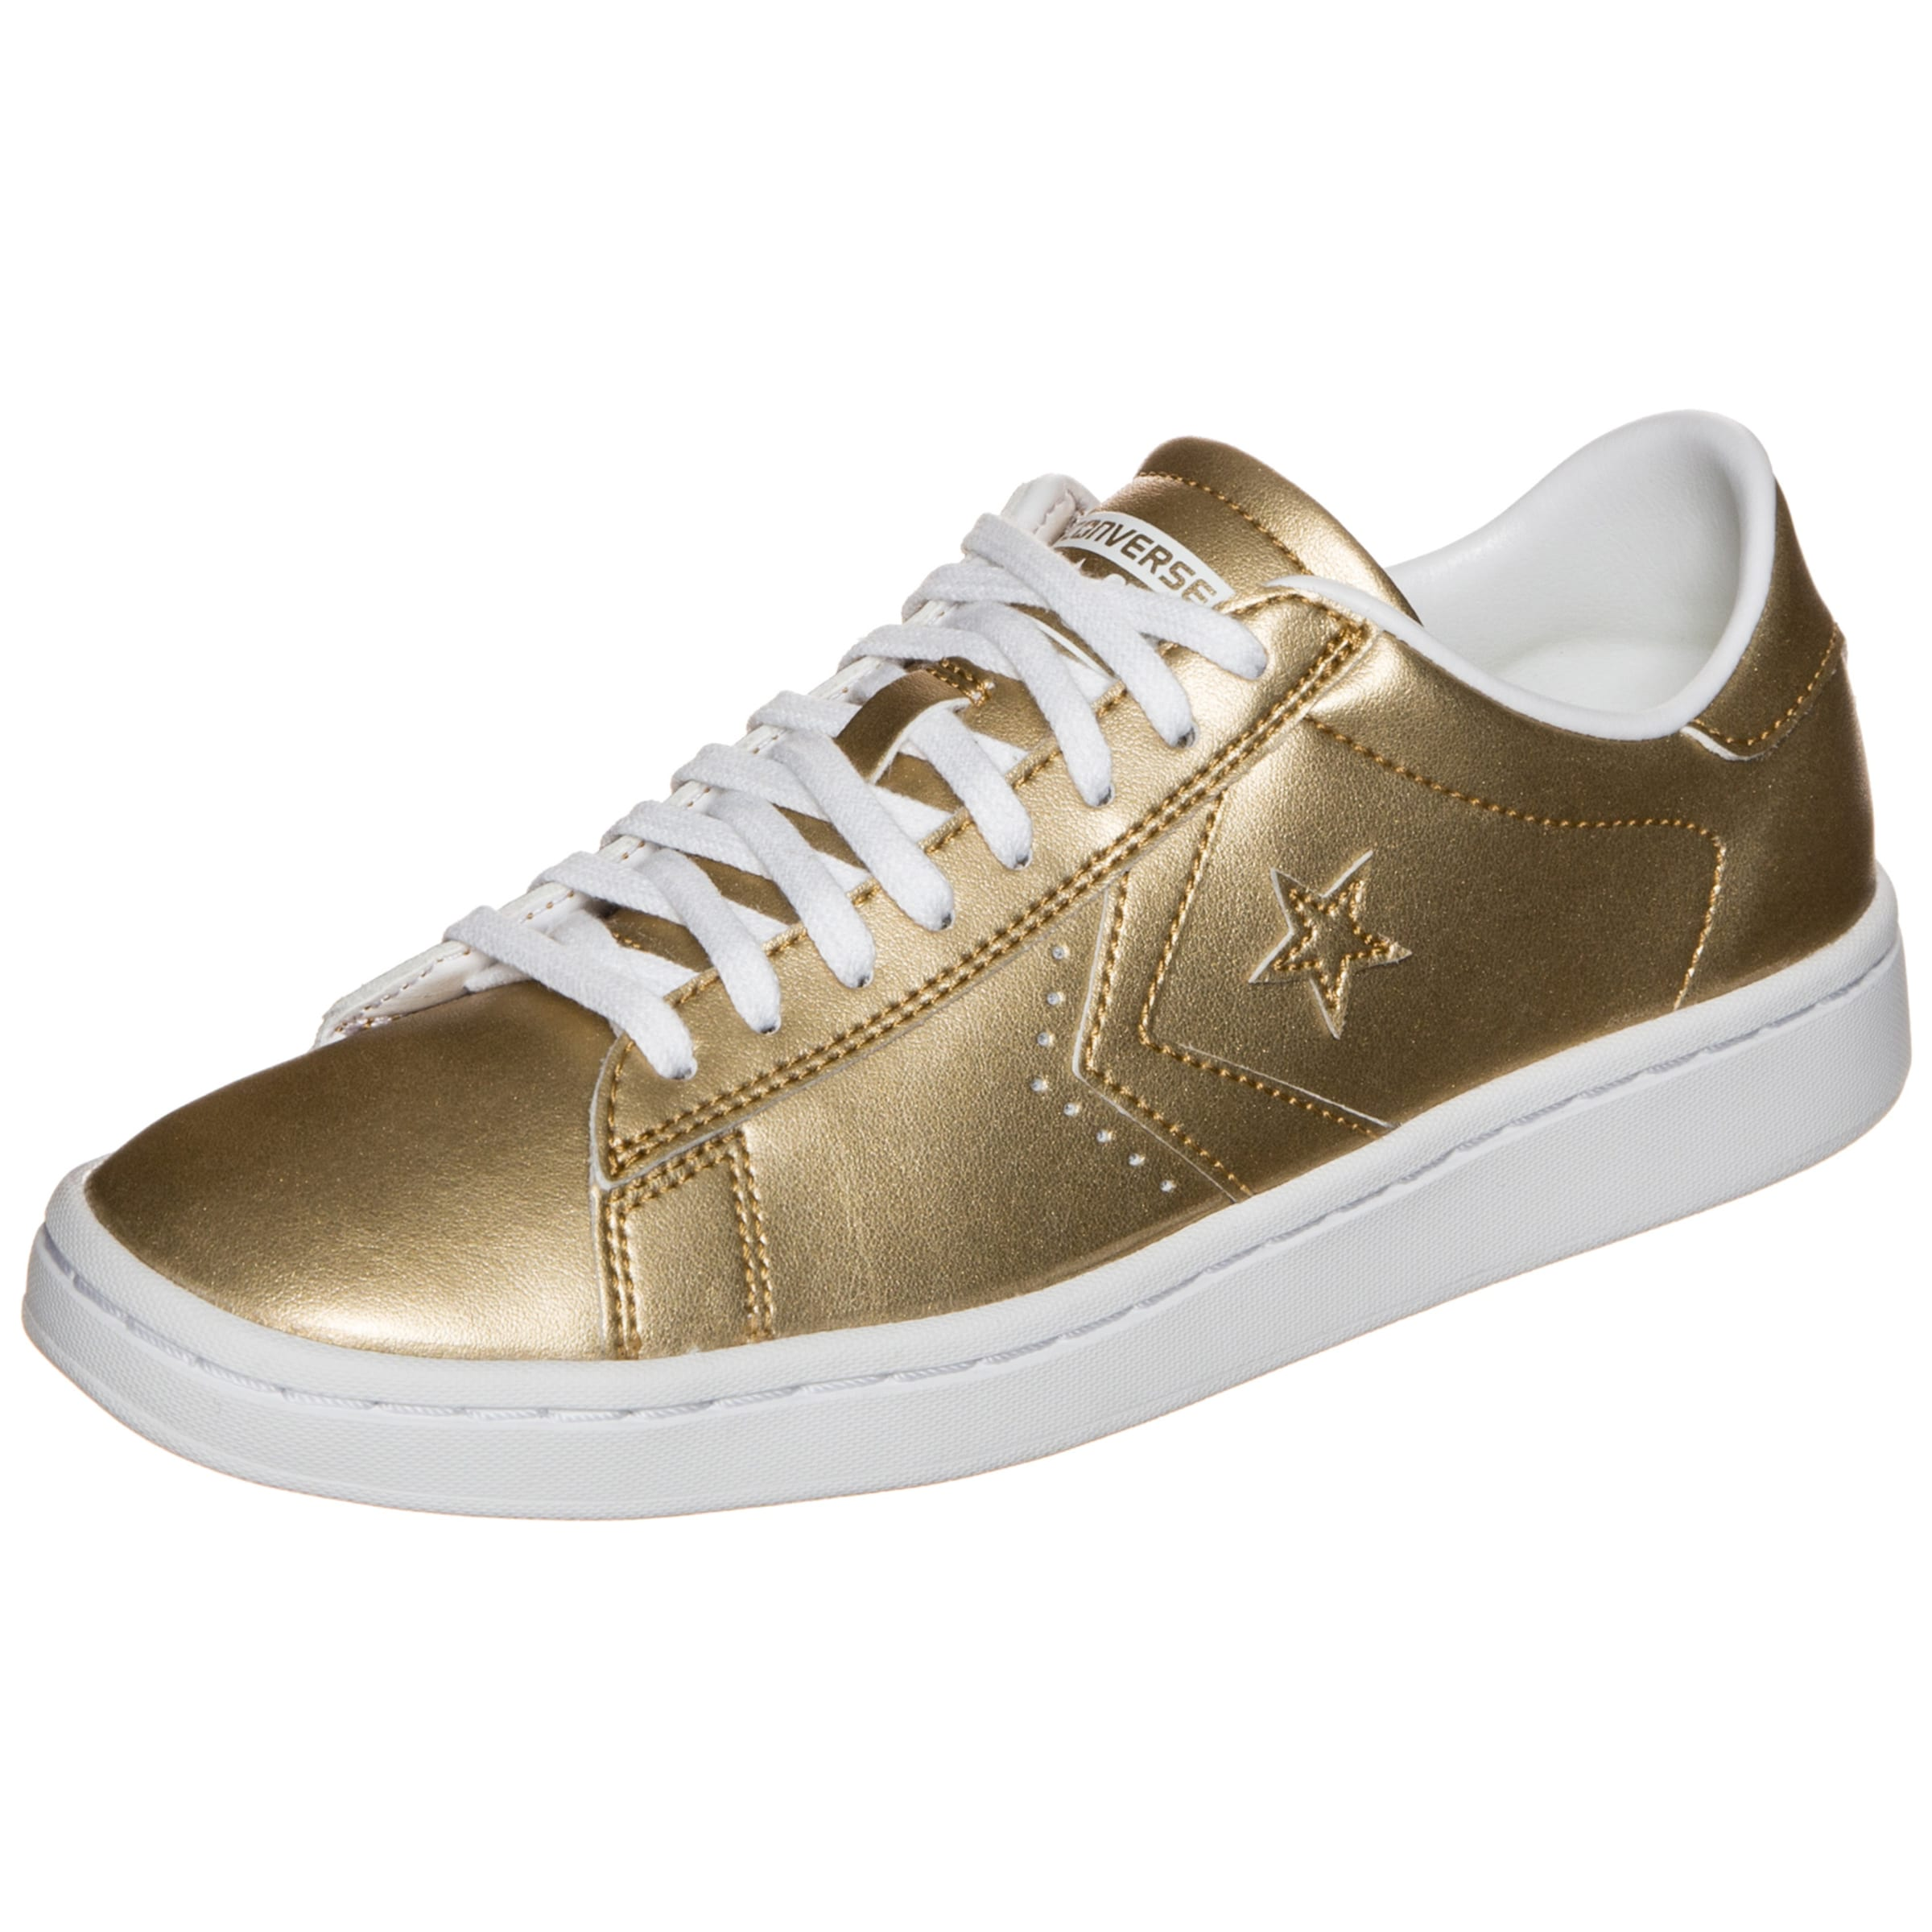 Pro Metallic In Converse Leather Ox Gold Lp Sneaker 8ynwvmP0ON